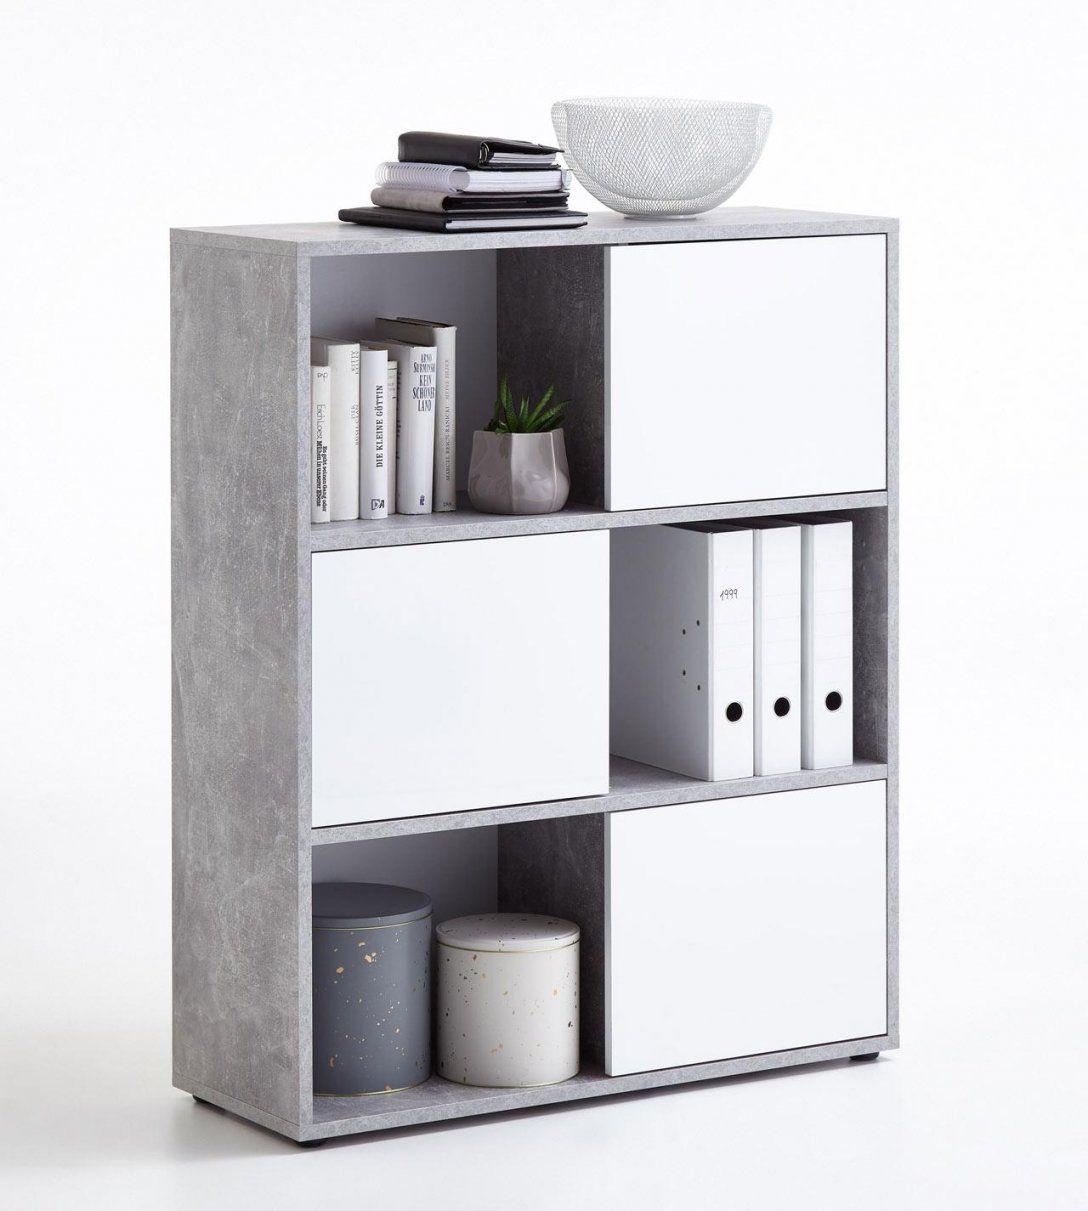 Regal In Grau Beton Türen In Hochglanz Weiß  Kaufen Bei von Regal Mit Türen Weiß Hochglanz Bild